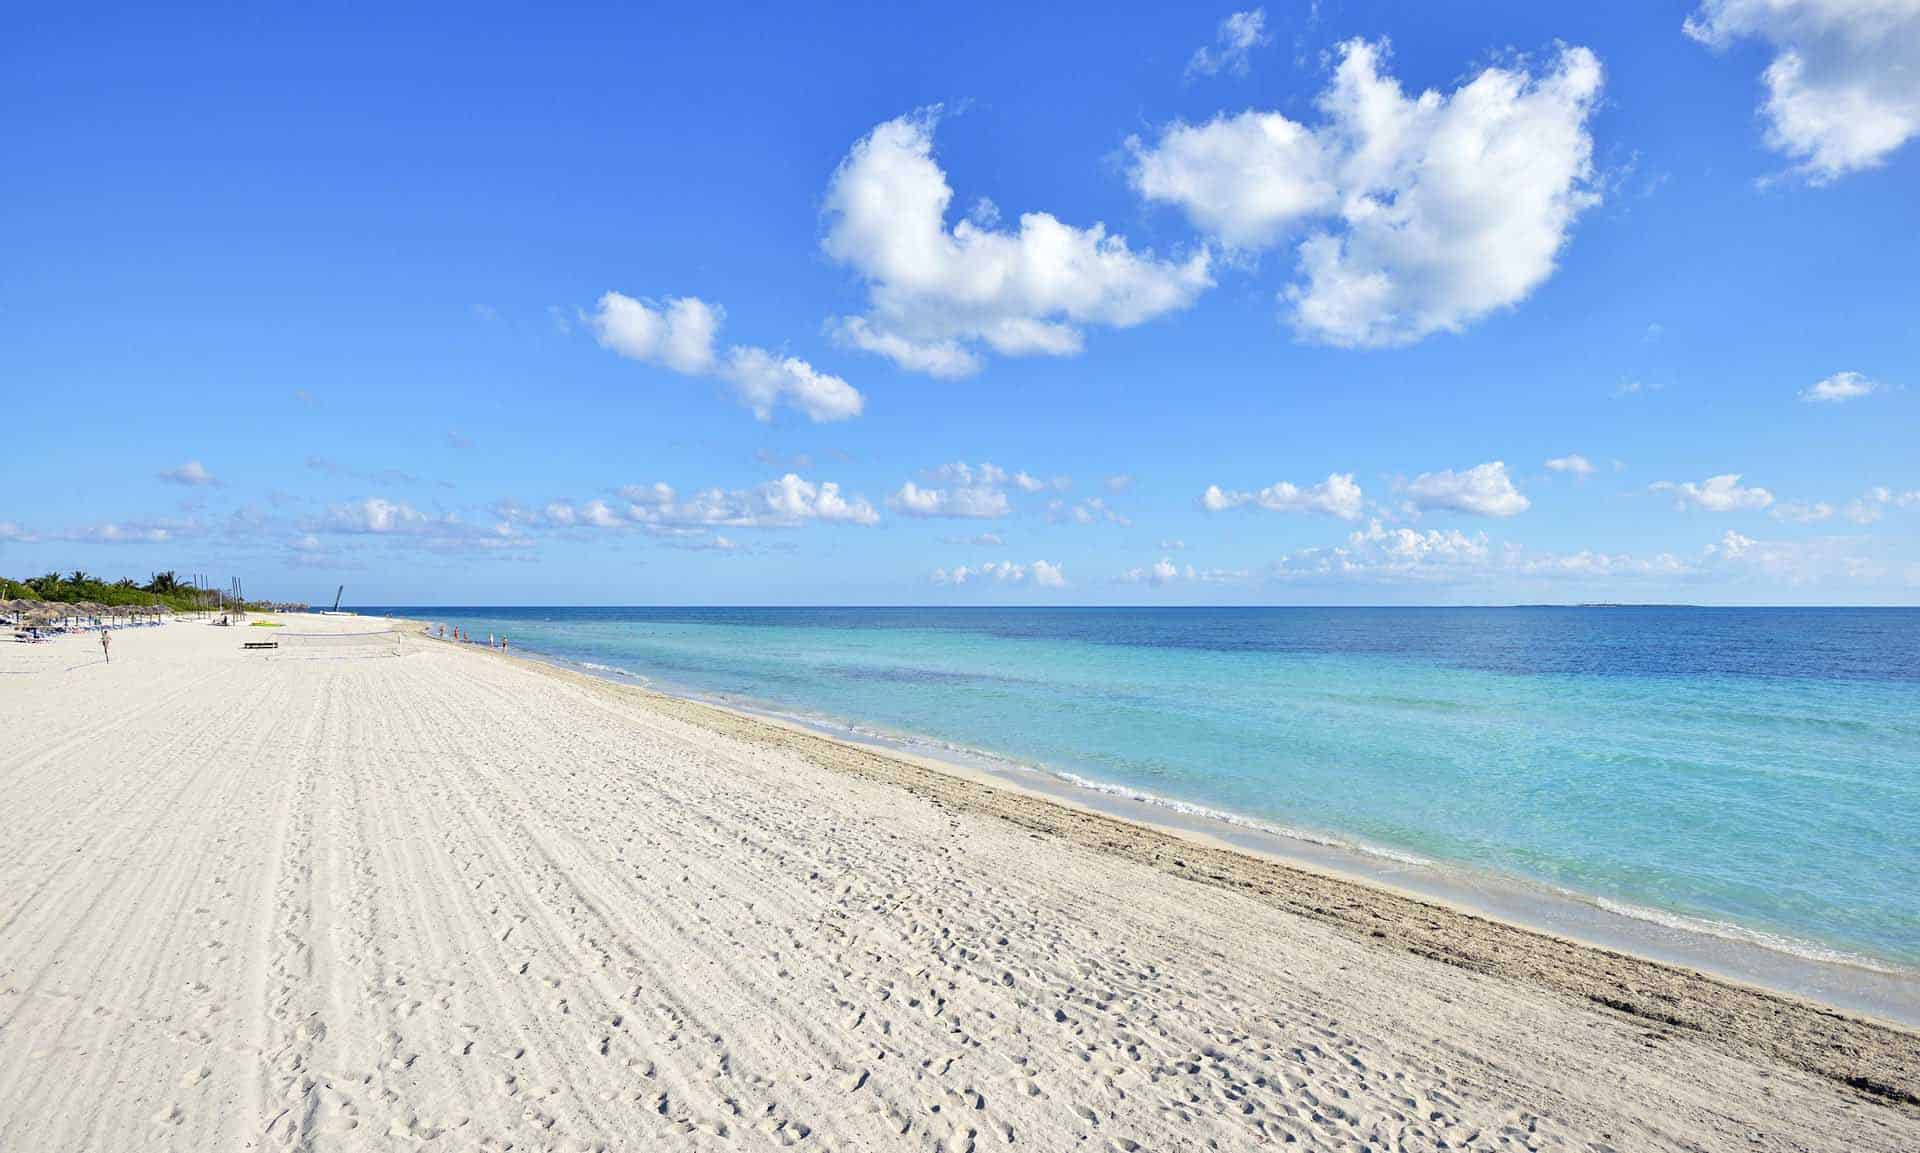 varadero plage mer cuba autrement 2